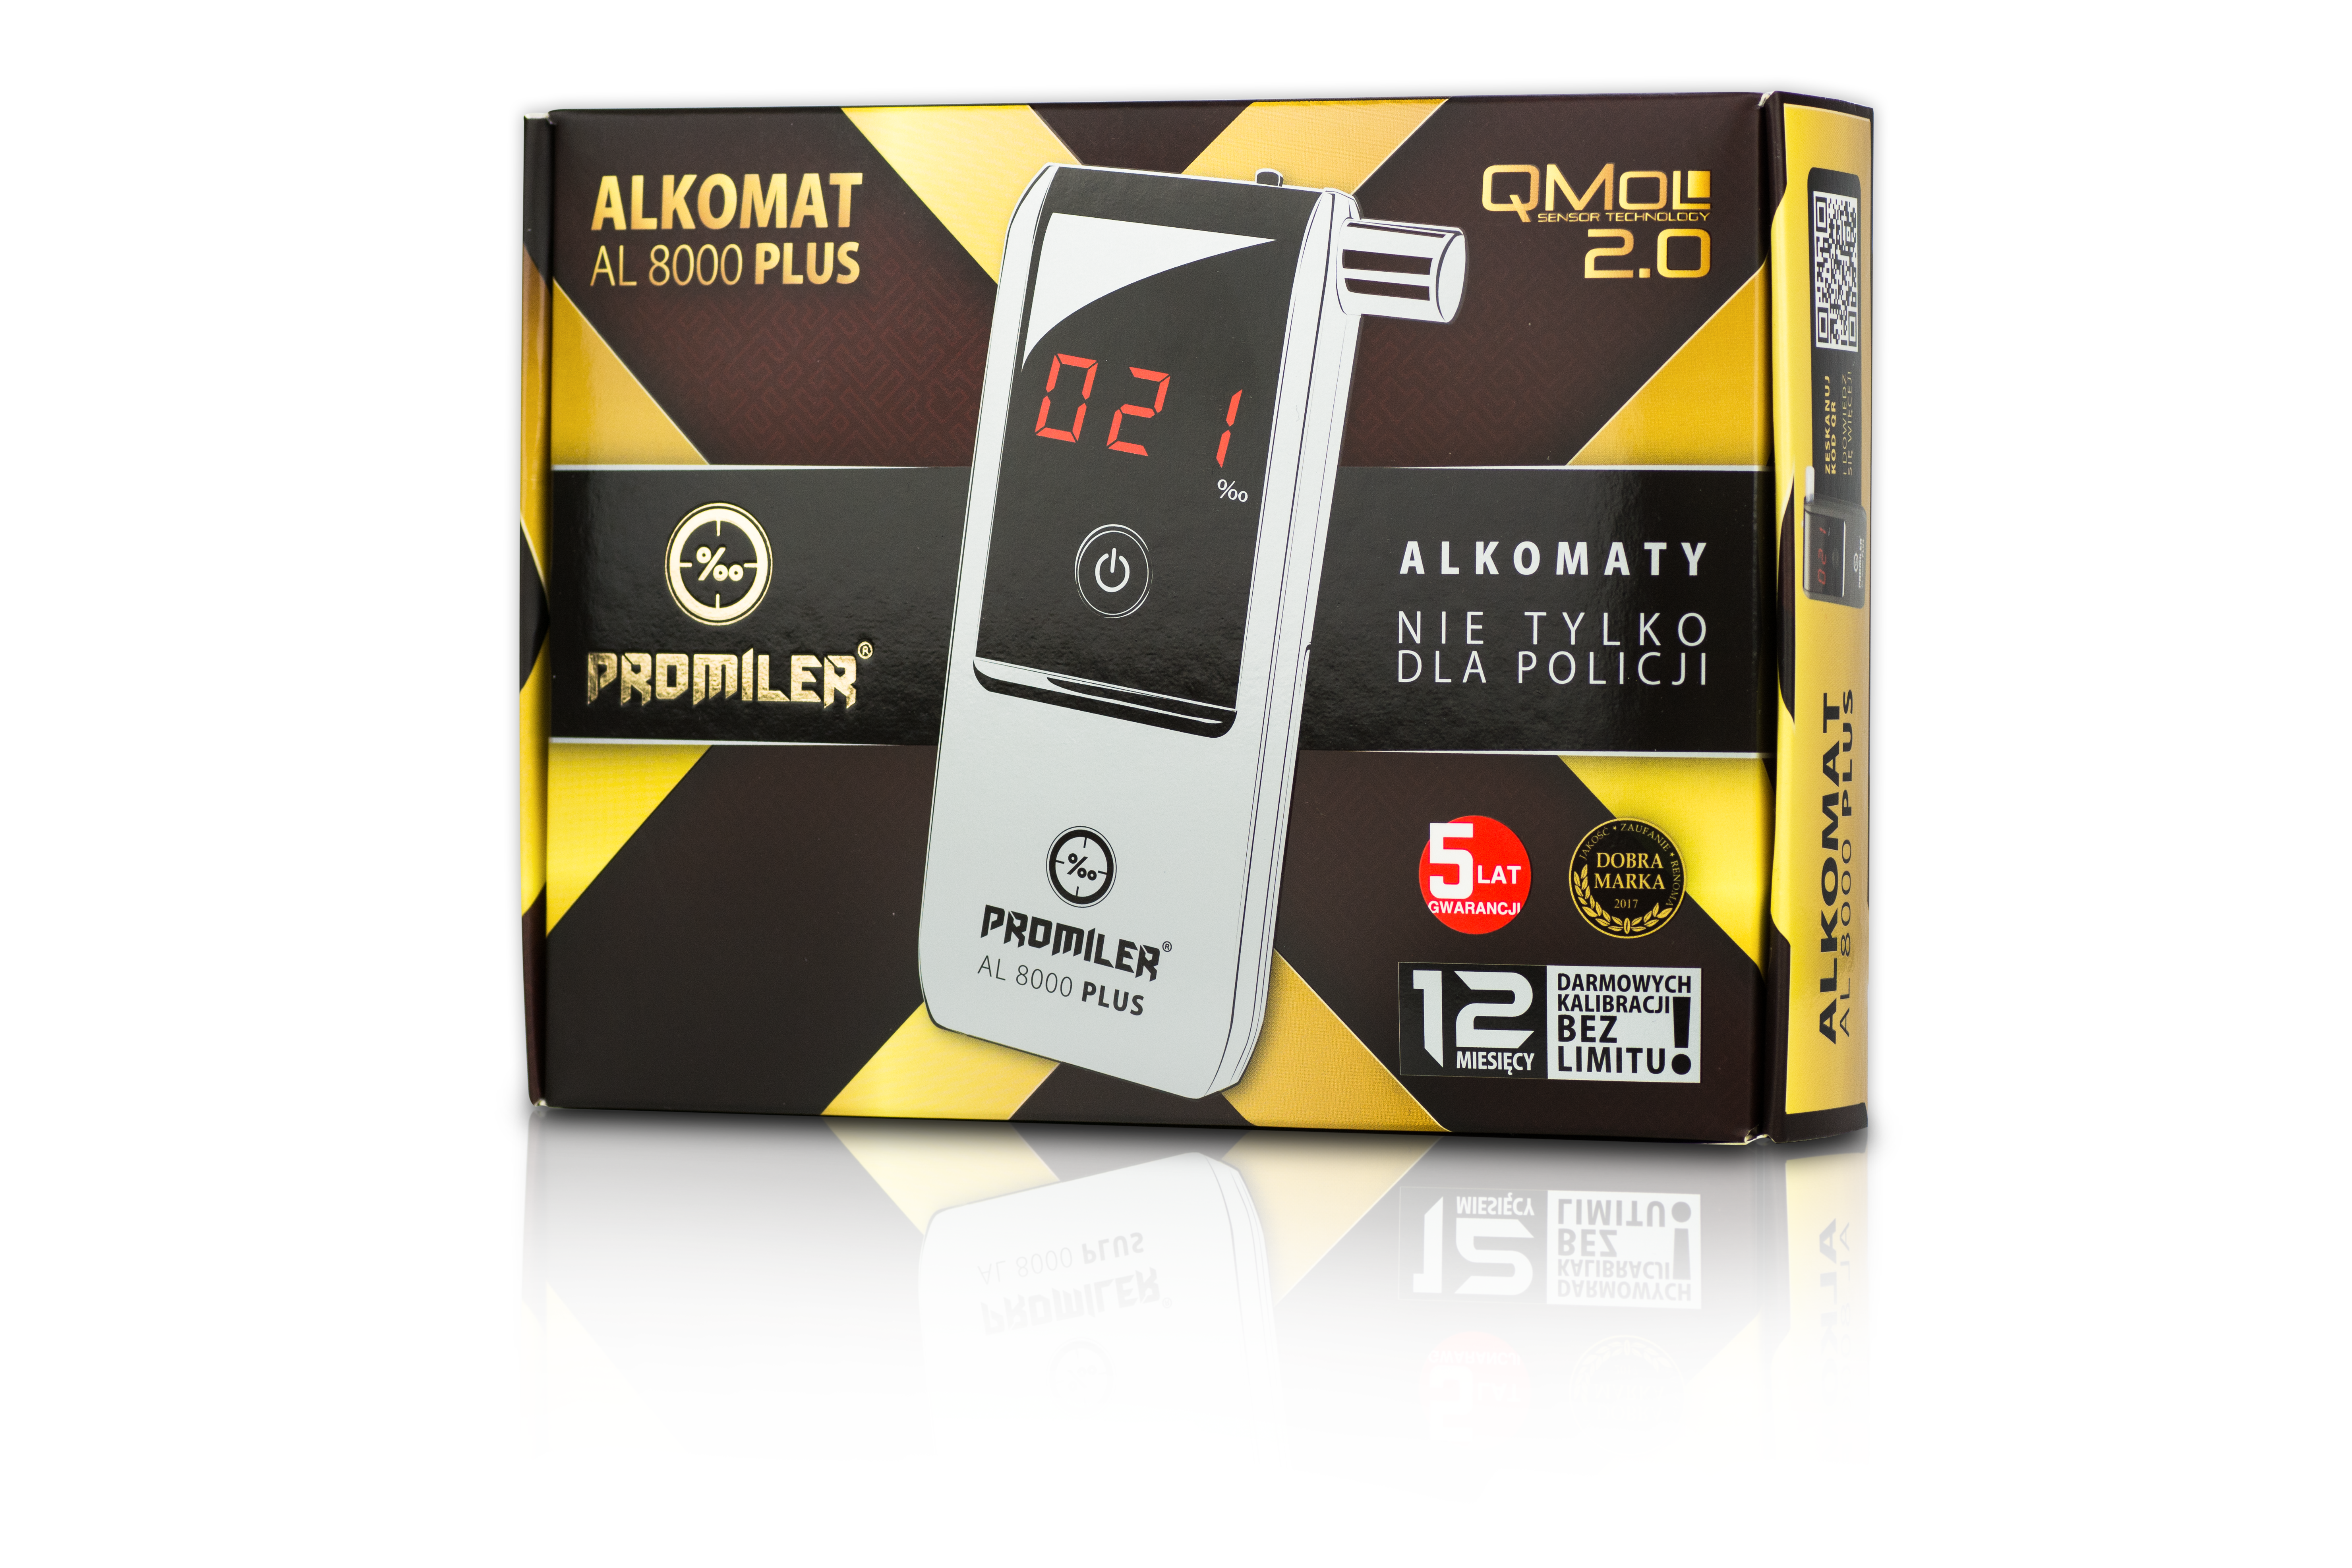 Alkomat Promiler AL 8000 Plus